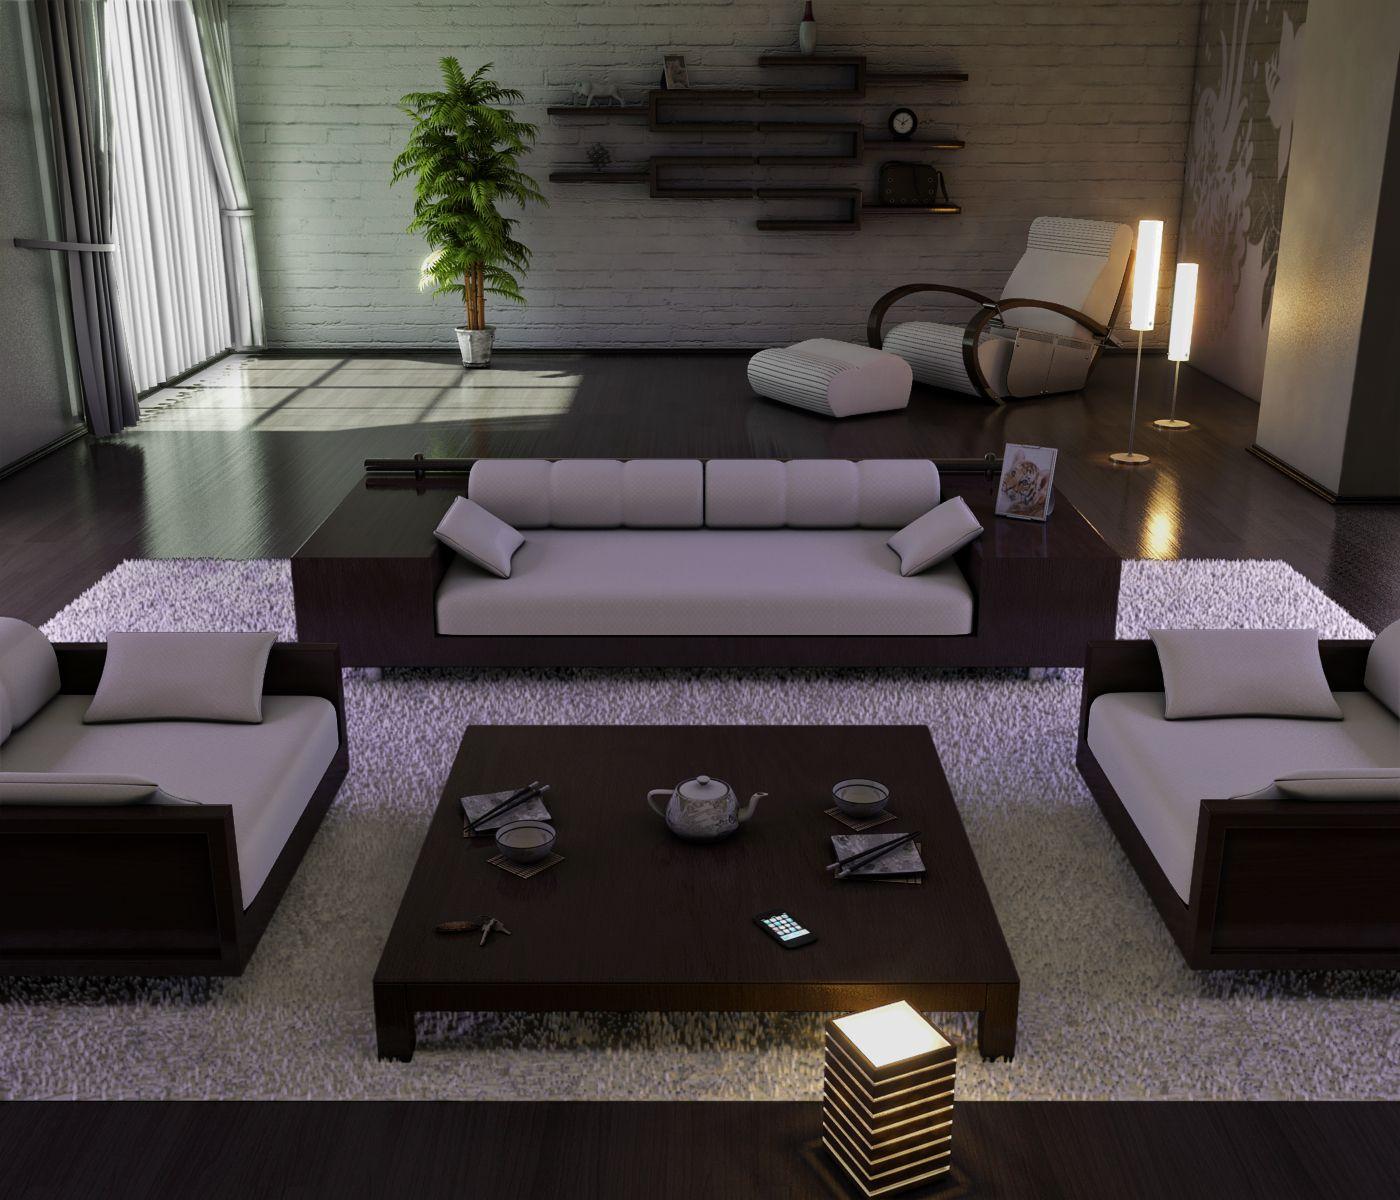 Sala de estar levemente japonesa. | Trabalhos | Pinterest | Sala de ...